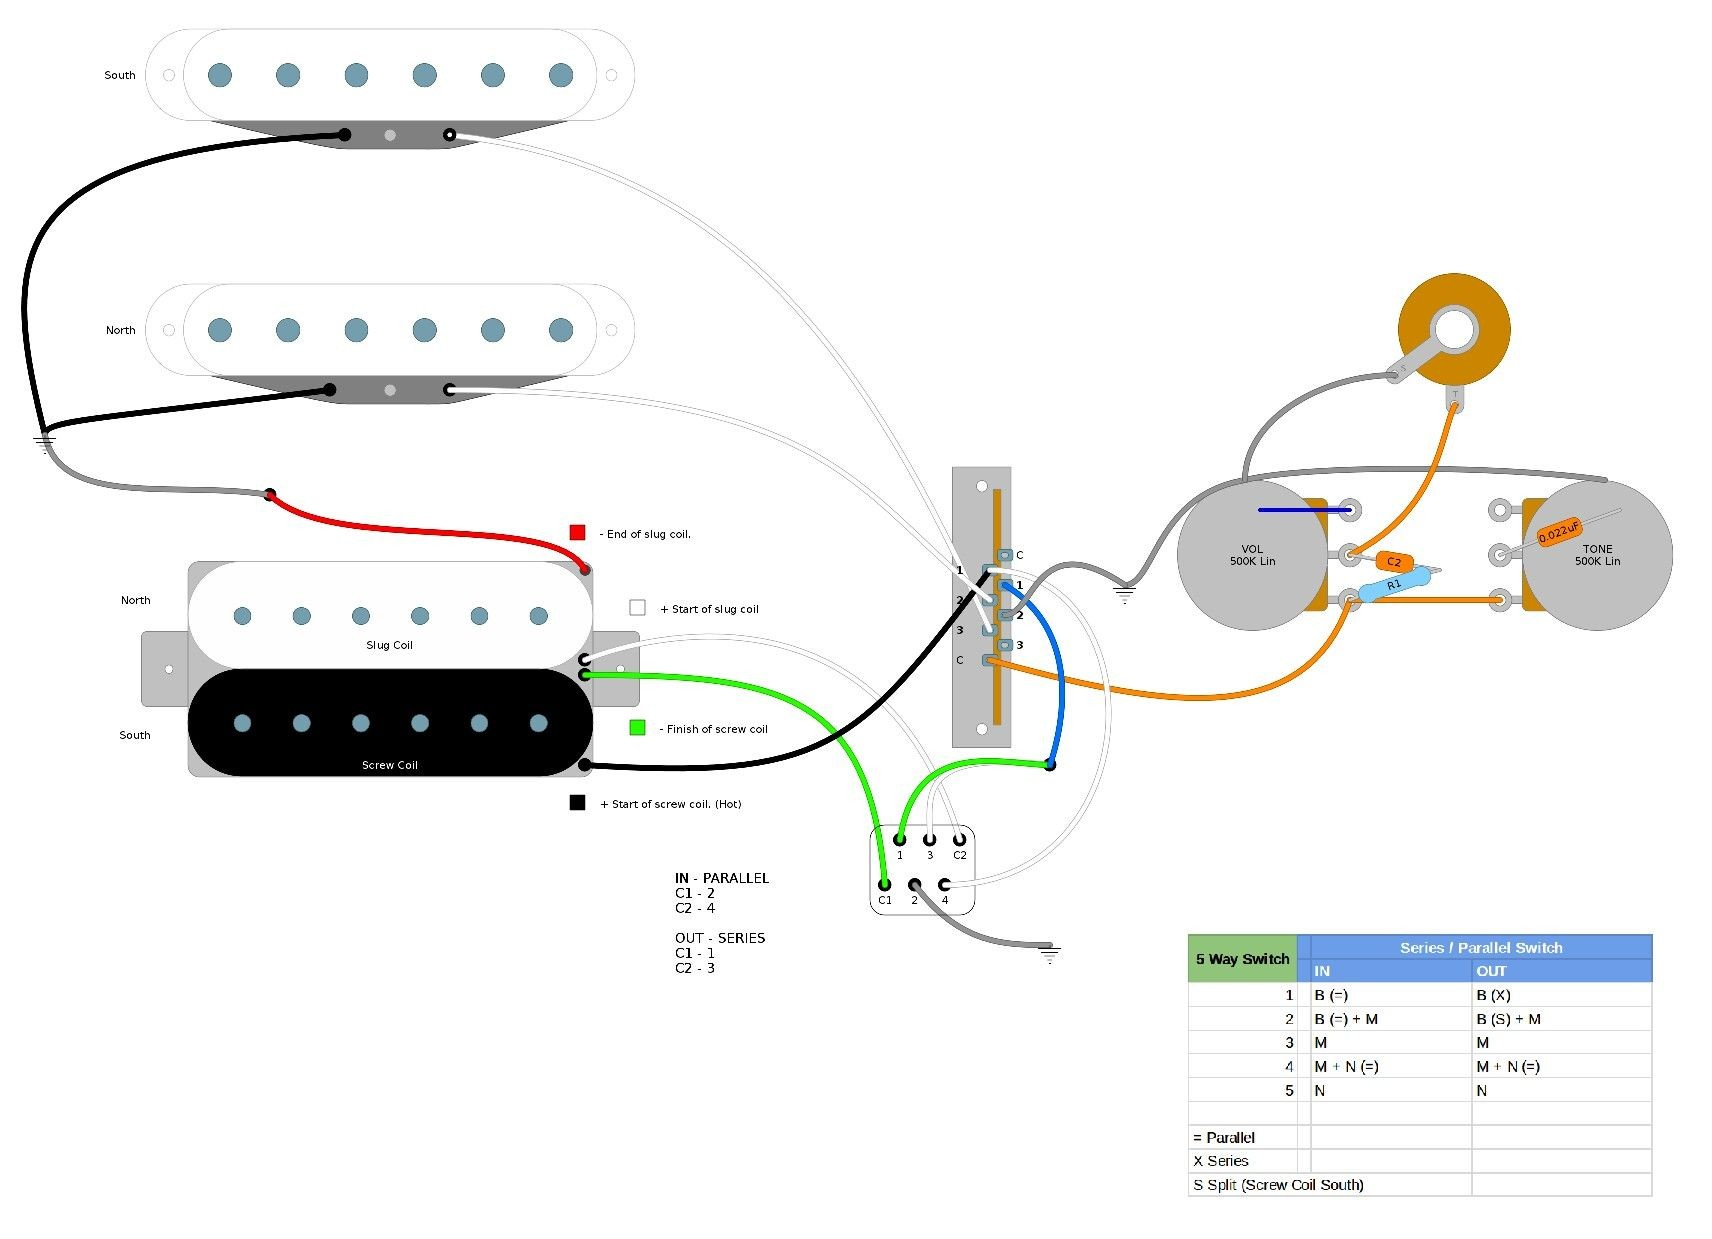 HSS Super Strat wiring diagram I m using Porter Pickups colour code Characteristics 1 Master Volume 1 Master Tone Humbucker in series or parallel